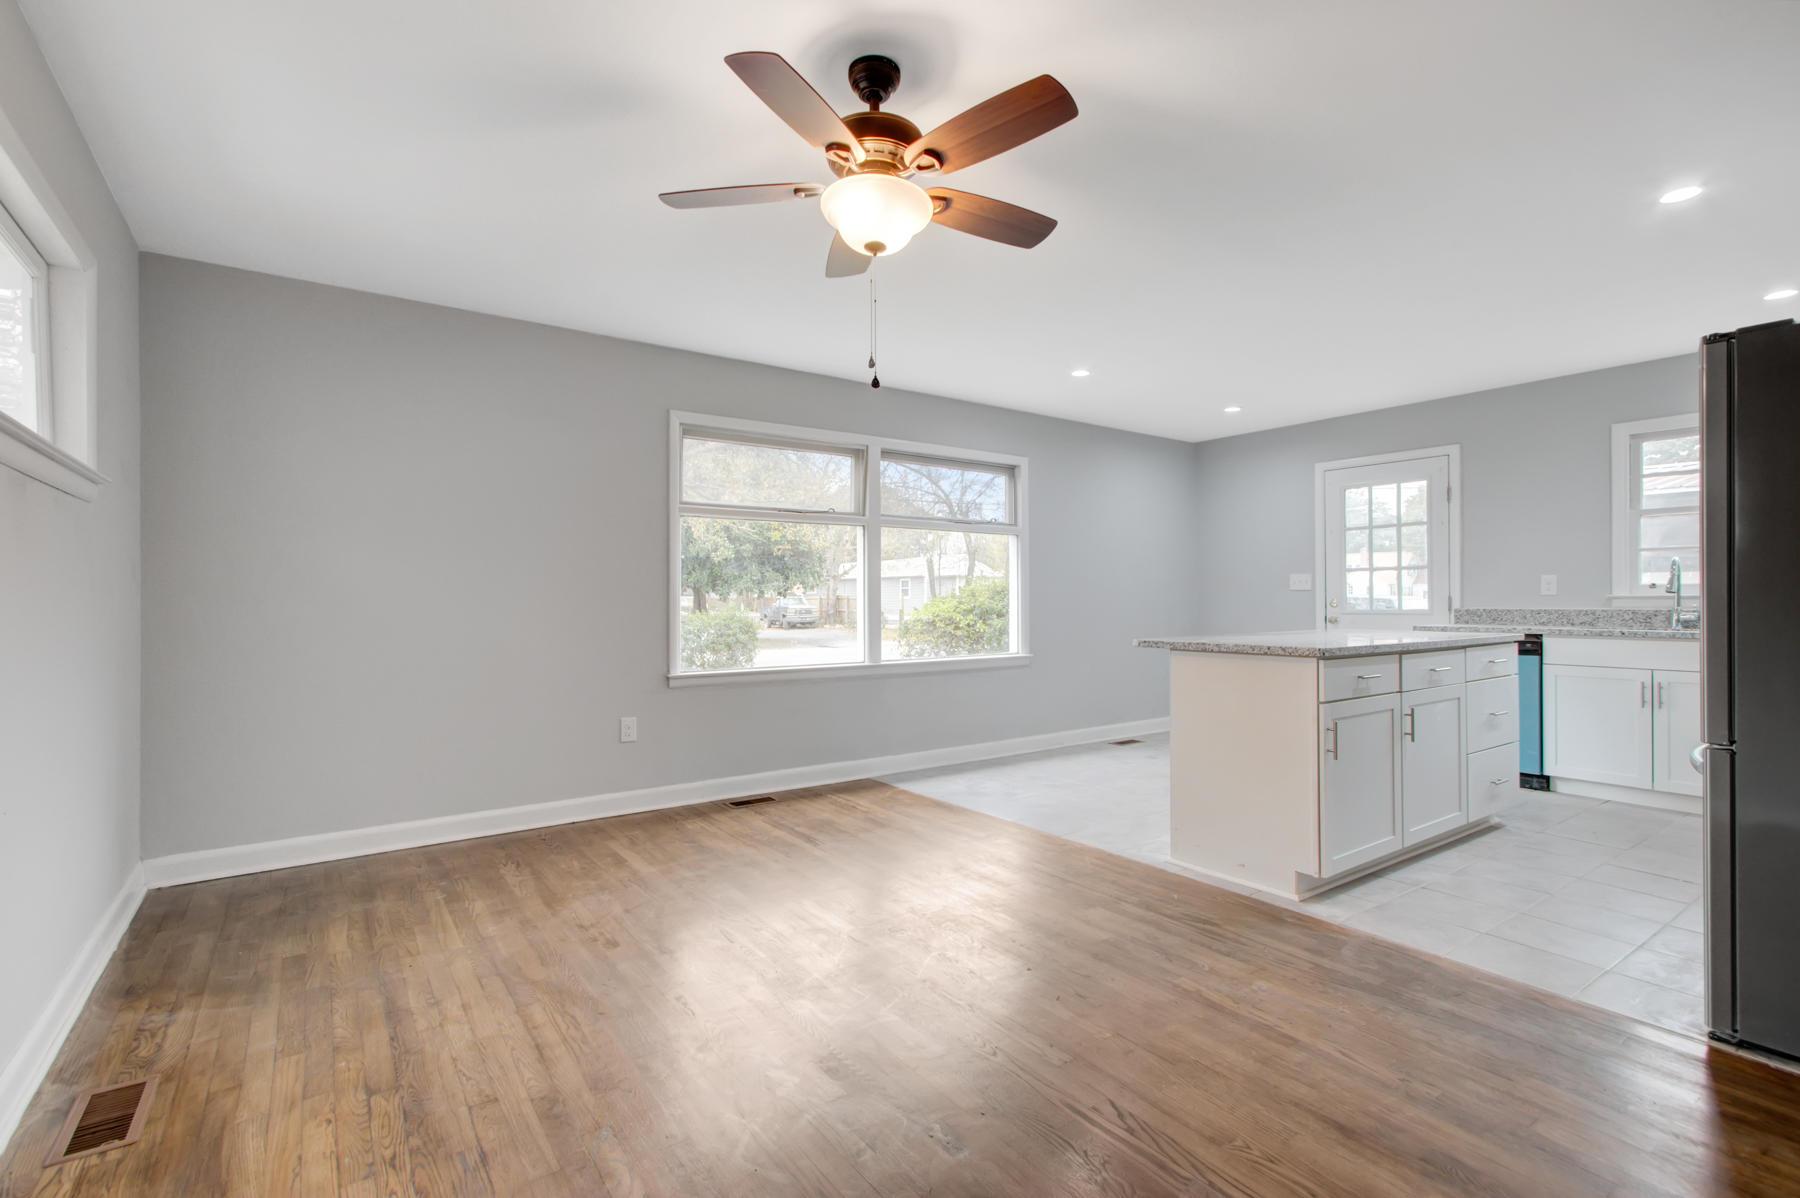 Port Park Homes For Sale - 5820 Sledge, Hanahan, SC - 5